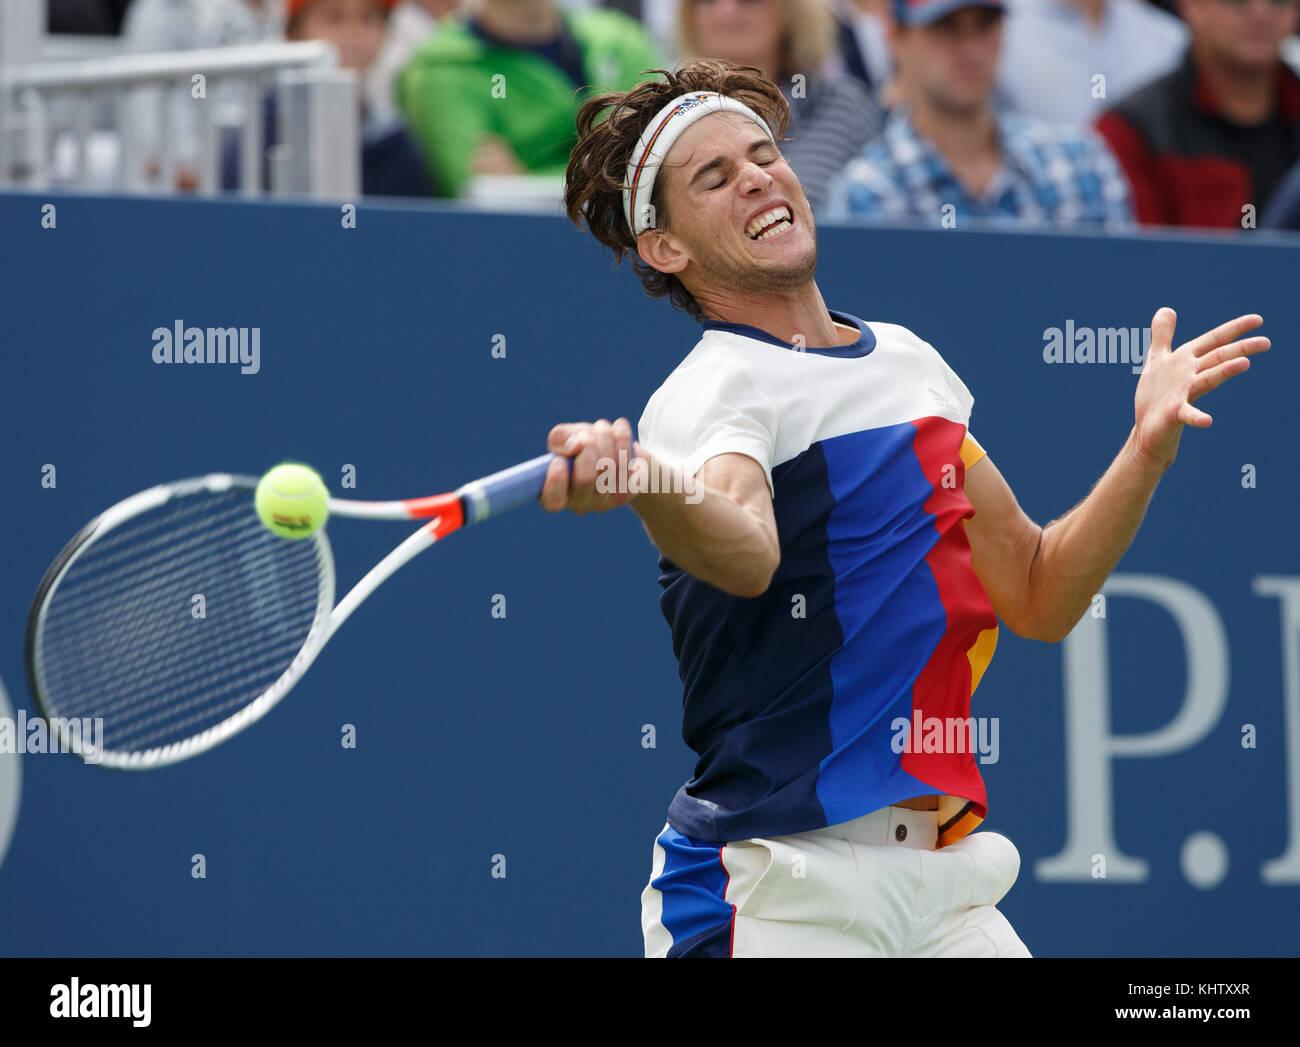 No look Austrian-tennis-player-dominic-thiem-aut-plays-forehand-shot-during-KHTXXR